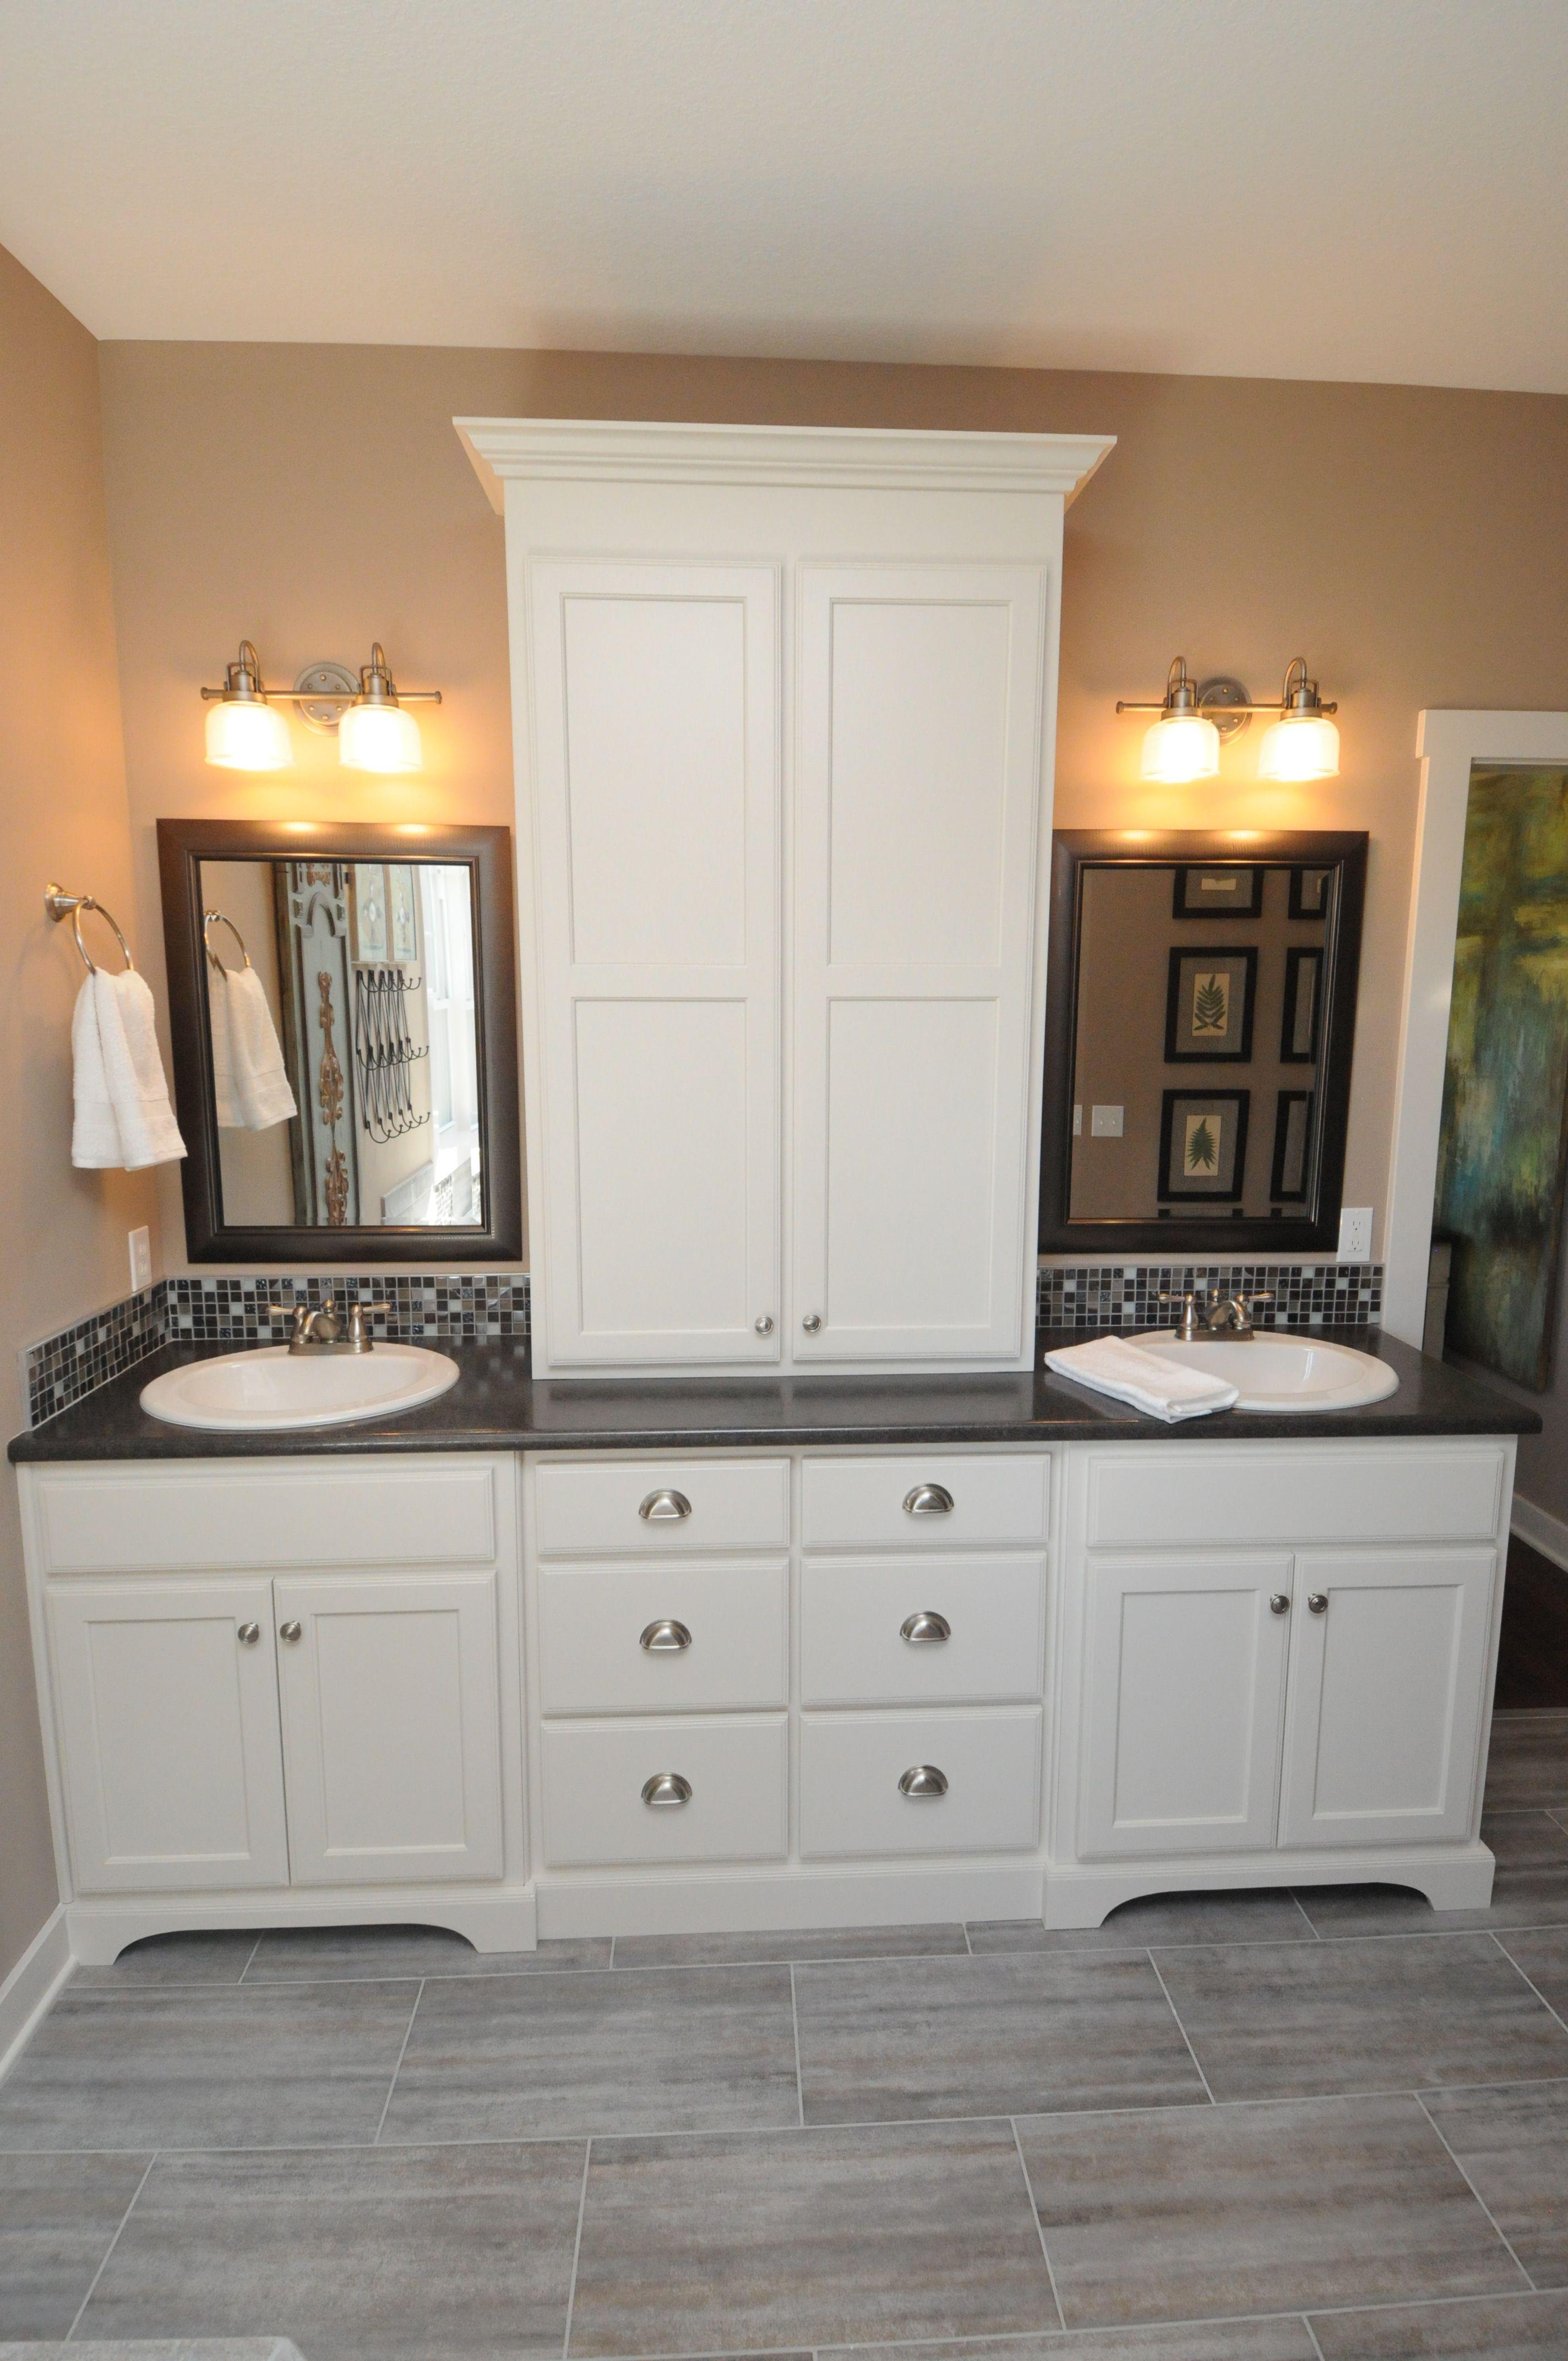 Linen Cabinet On Master Bathroom Vanity Bathroom Vanity Master Bathroom Vanity Linen Cabinet